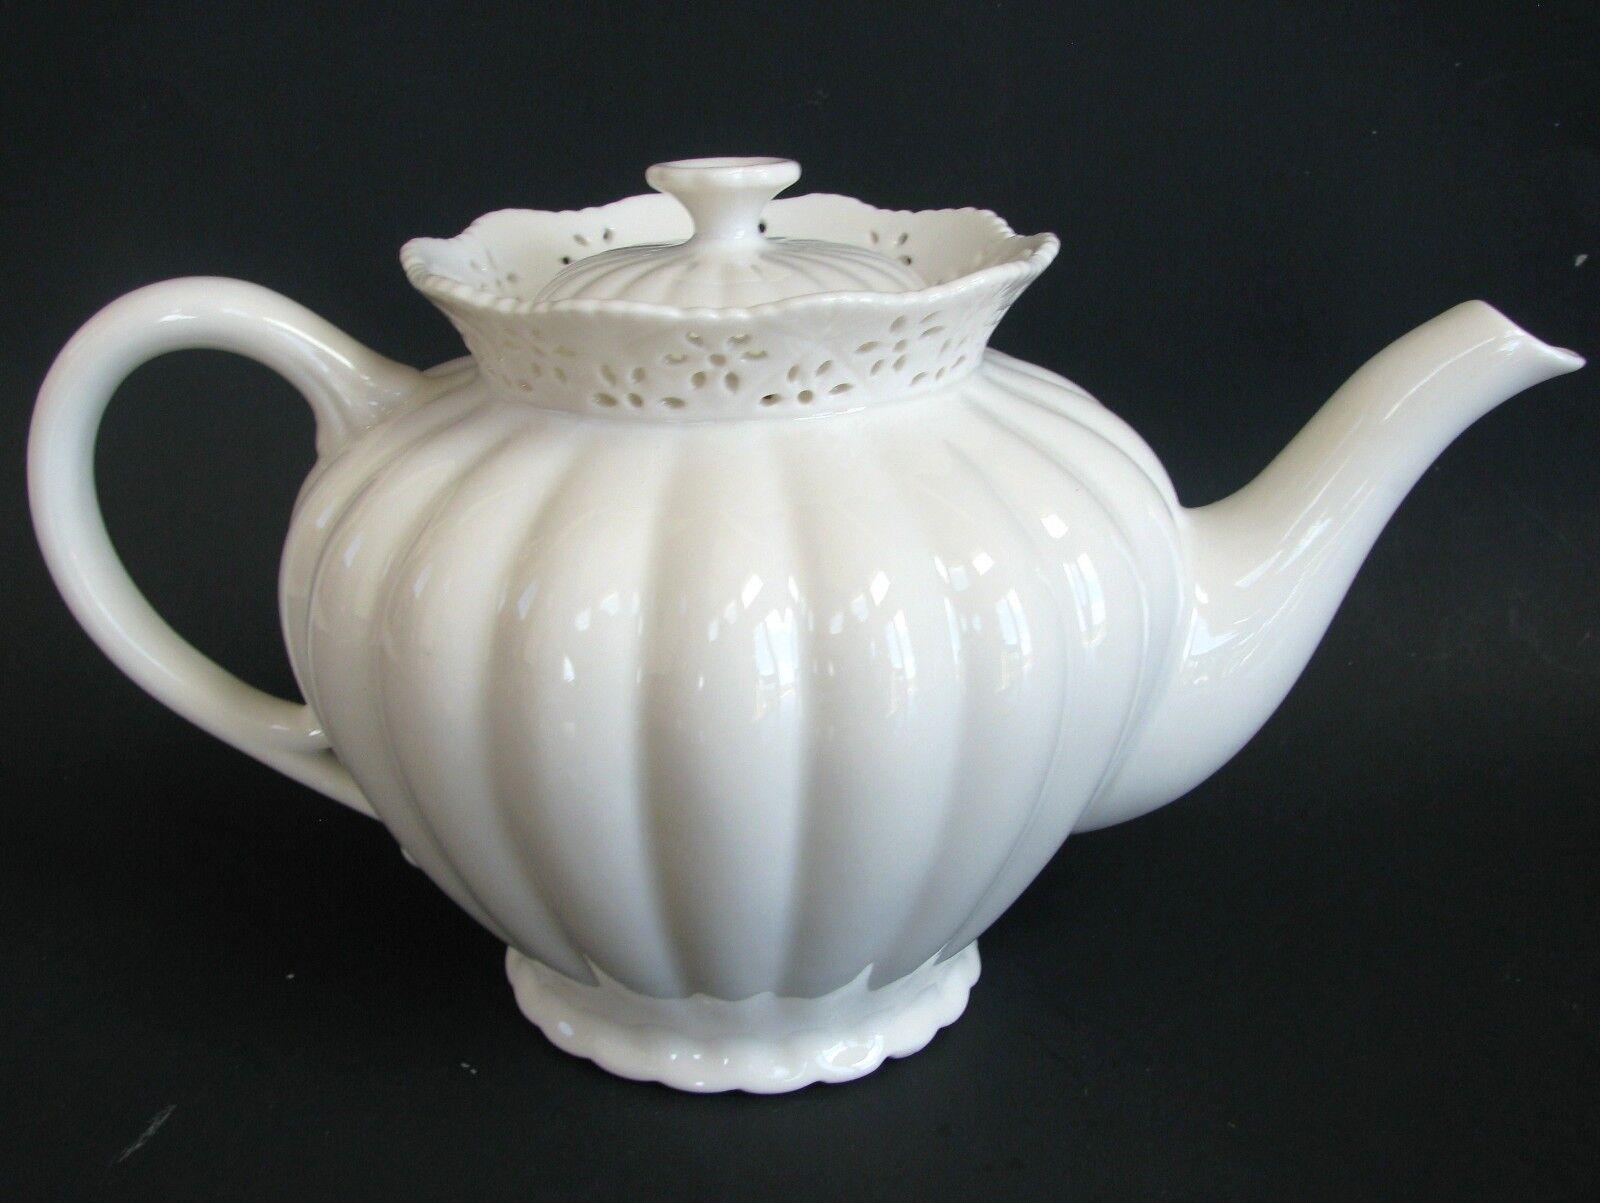 NEW GRACE TEA WARE WHITE TEA,COFFEE POT,TEAPOT-4.5 CUPS 36 OZ